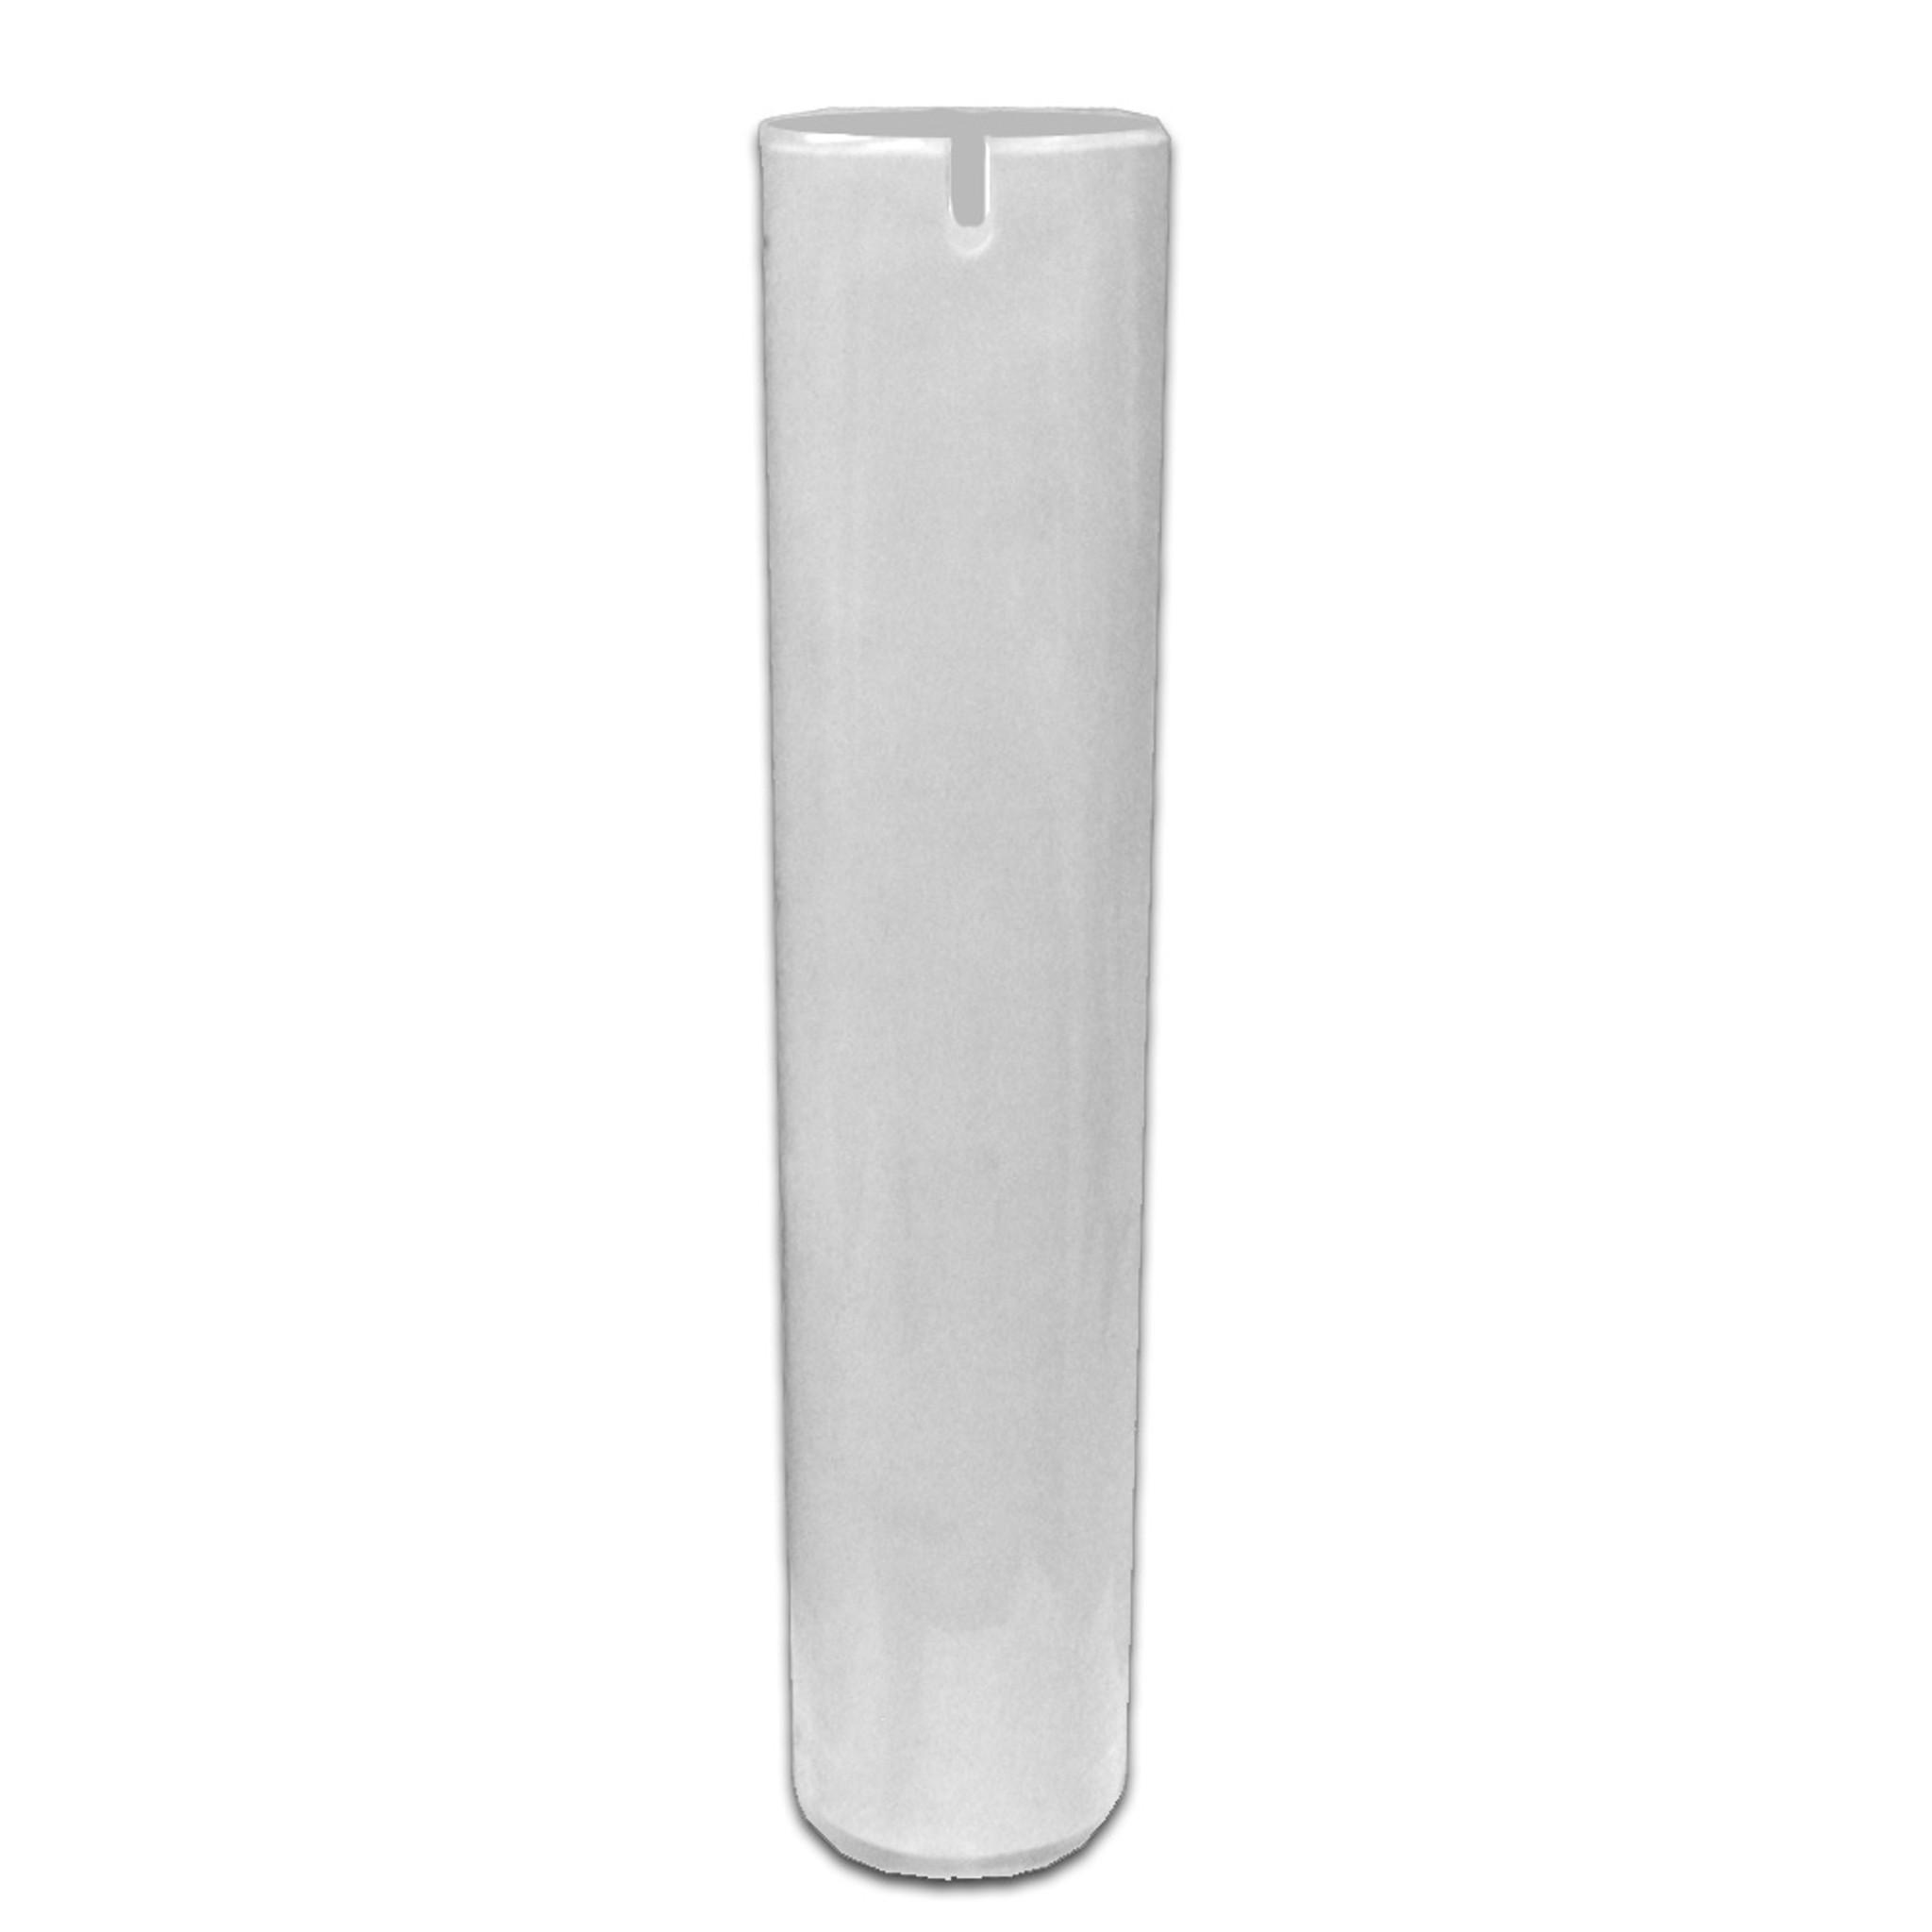 C.E Smith Flush Mount Rod Holder 15 Degree 53671A